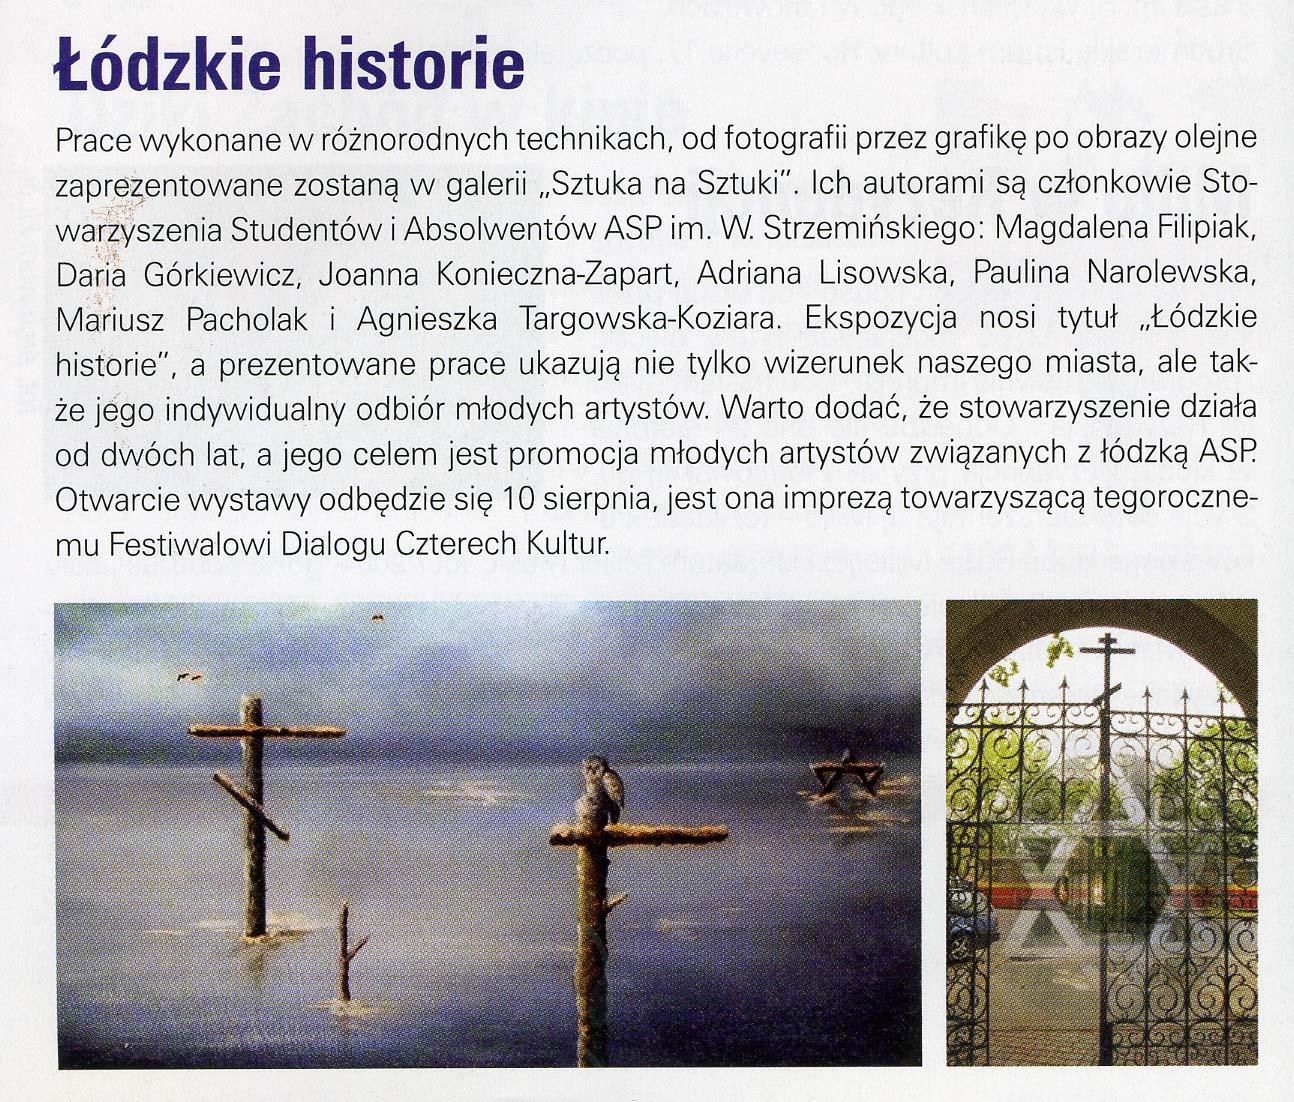 Festiwal Dialogu 4 Kultur 2007